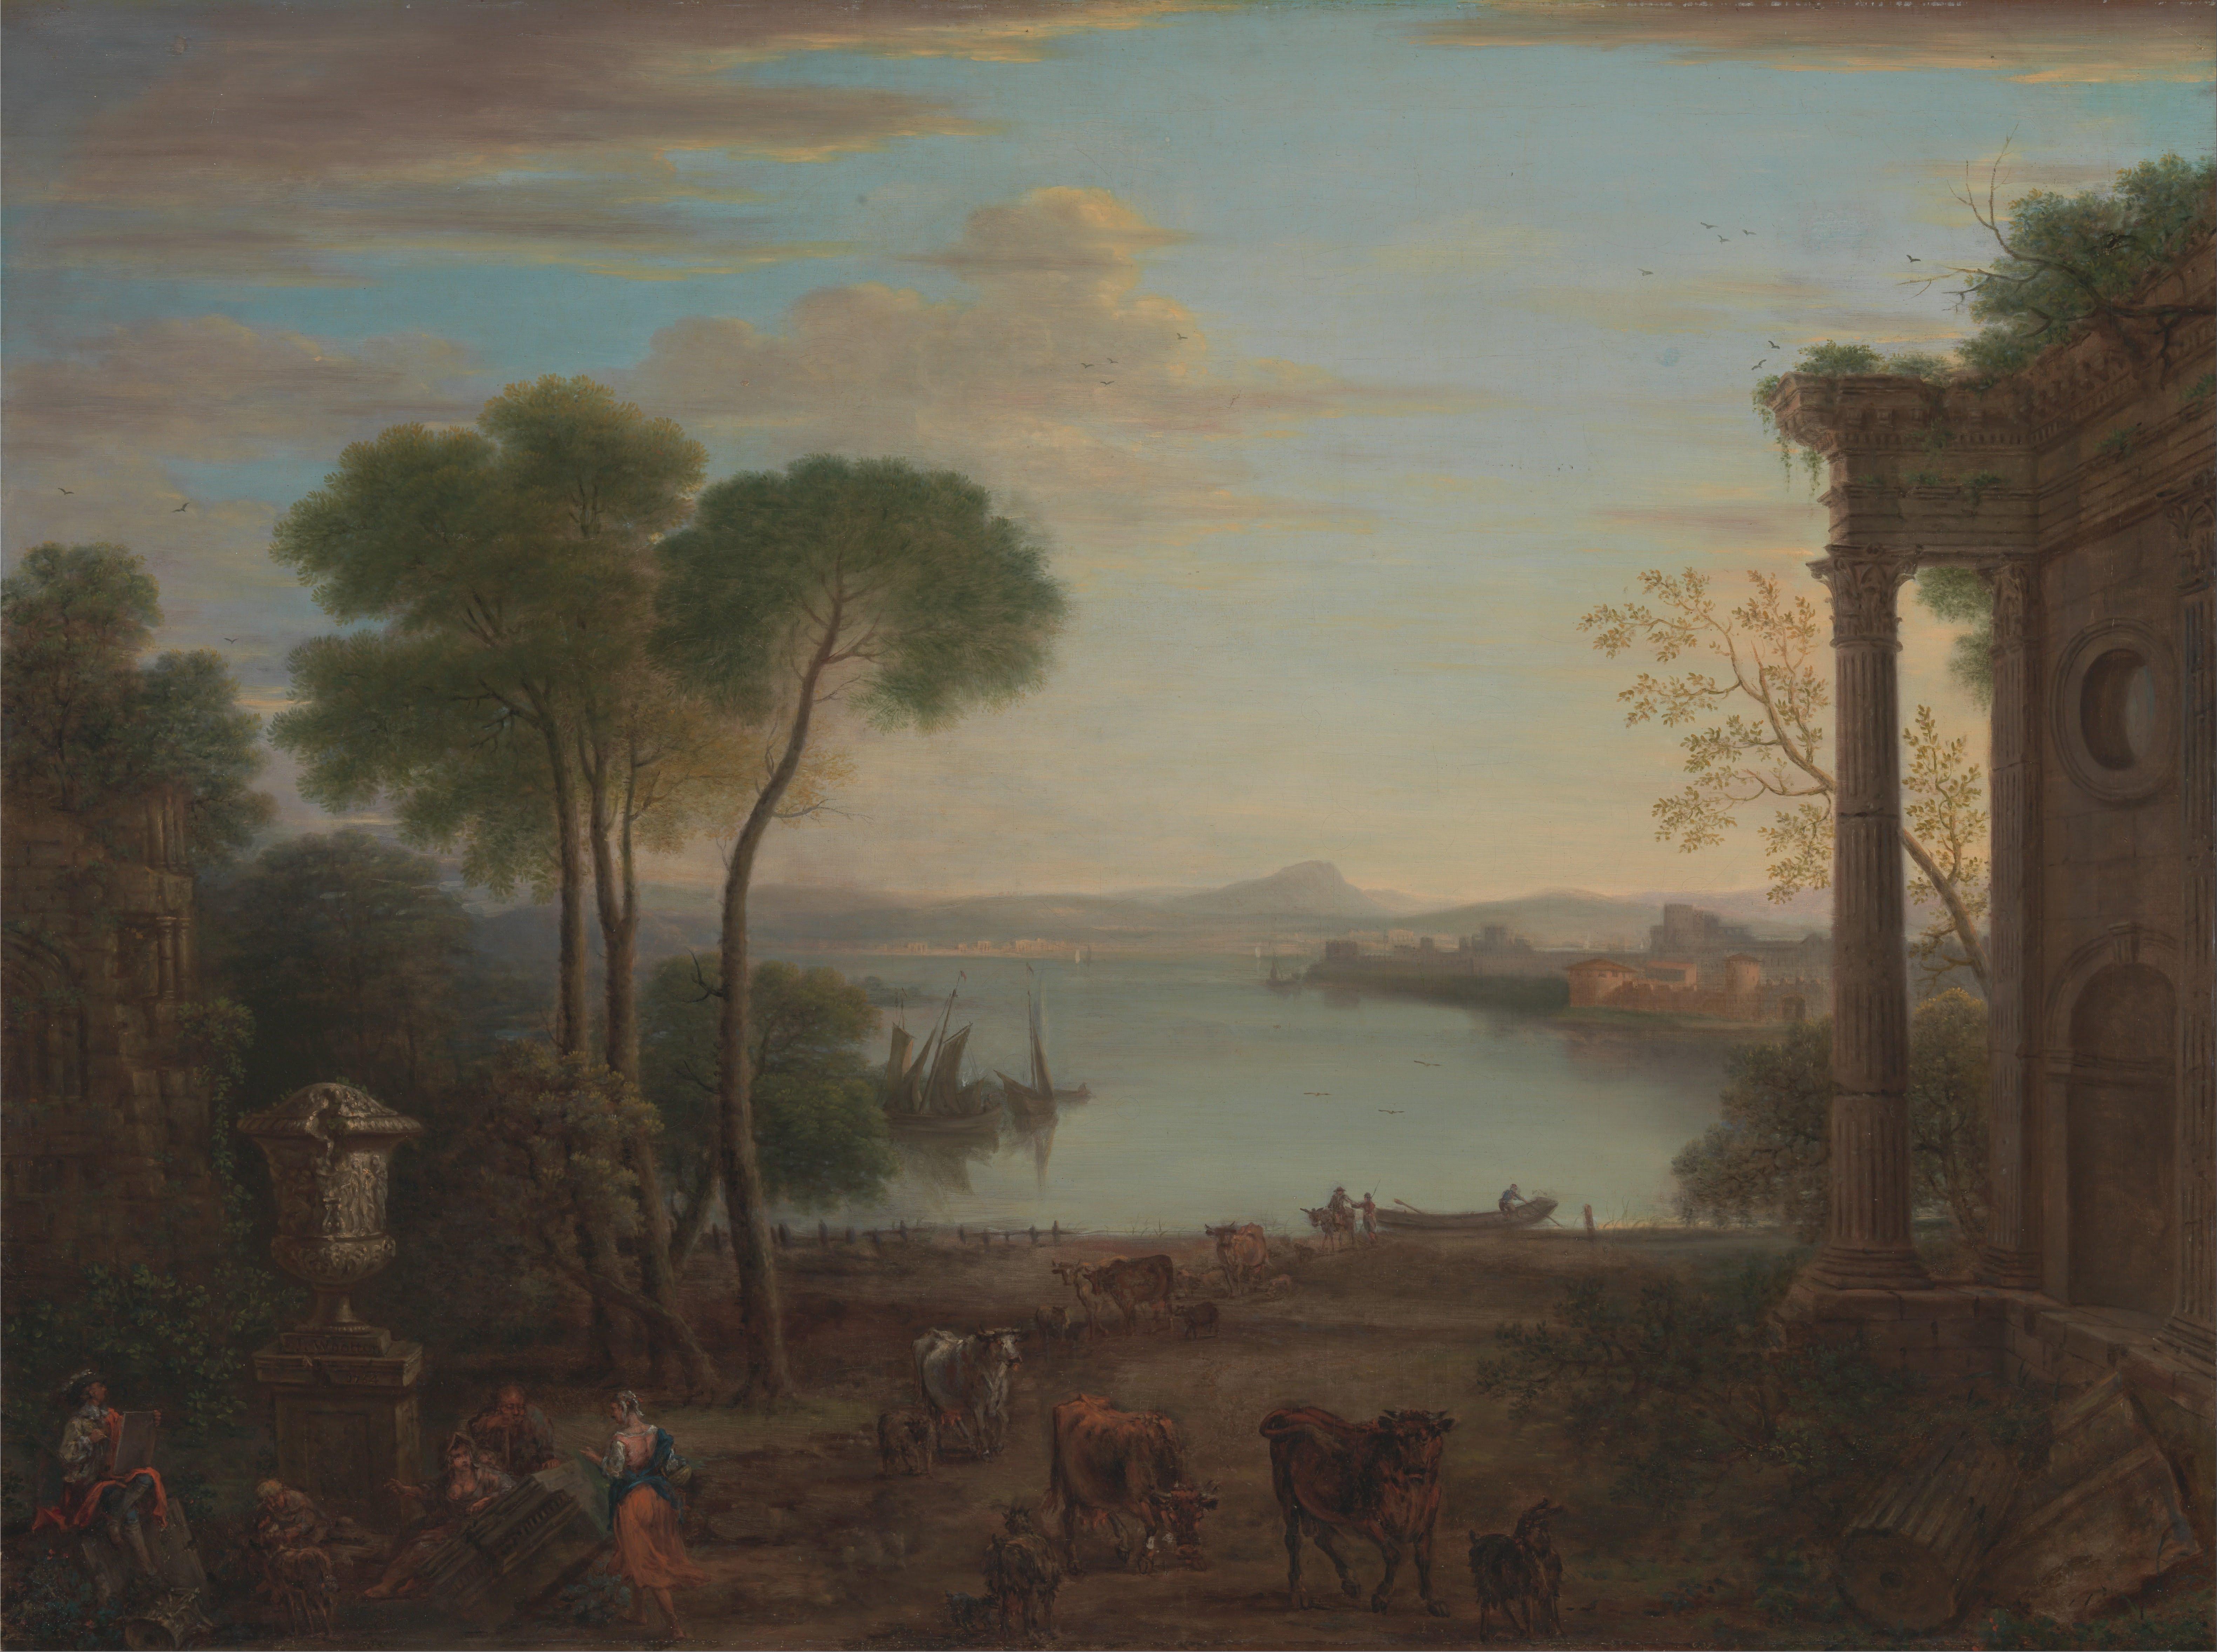 Karoly Marko A Classical Landscape painting anysize 50% off